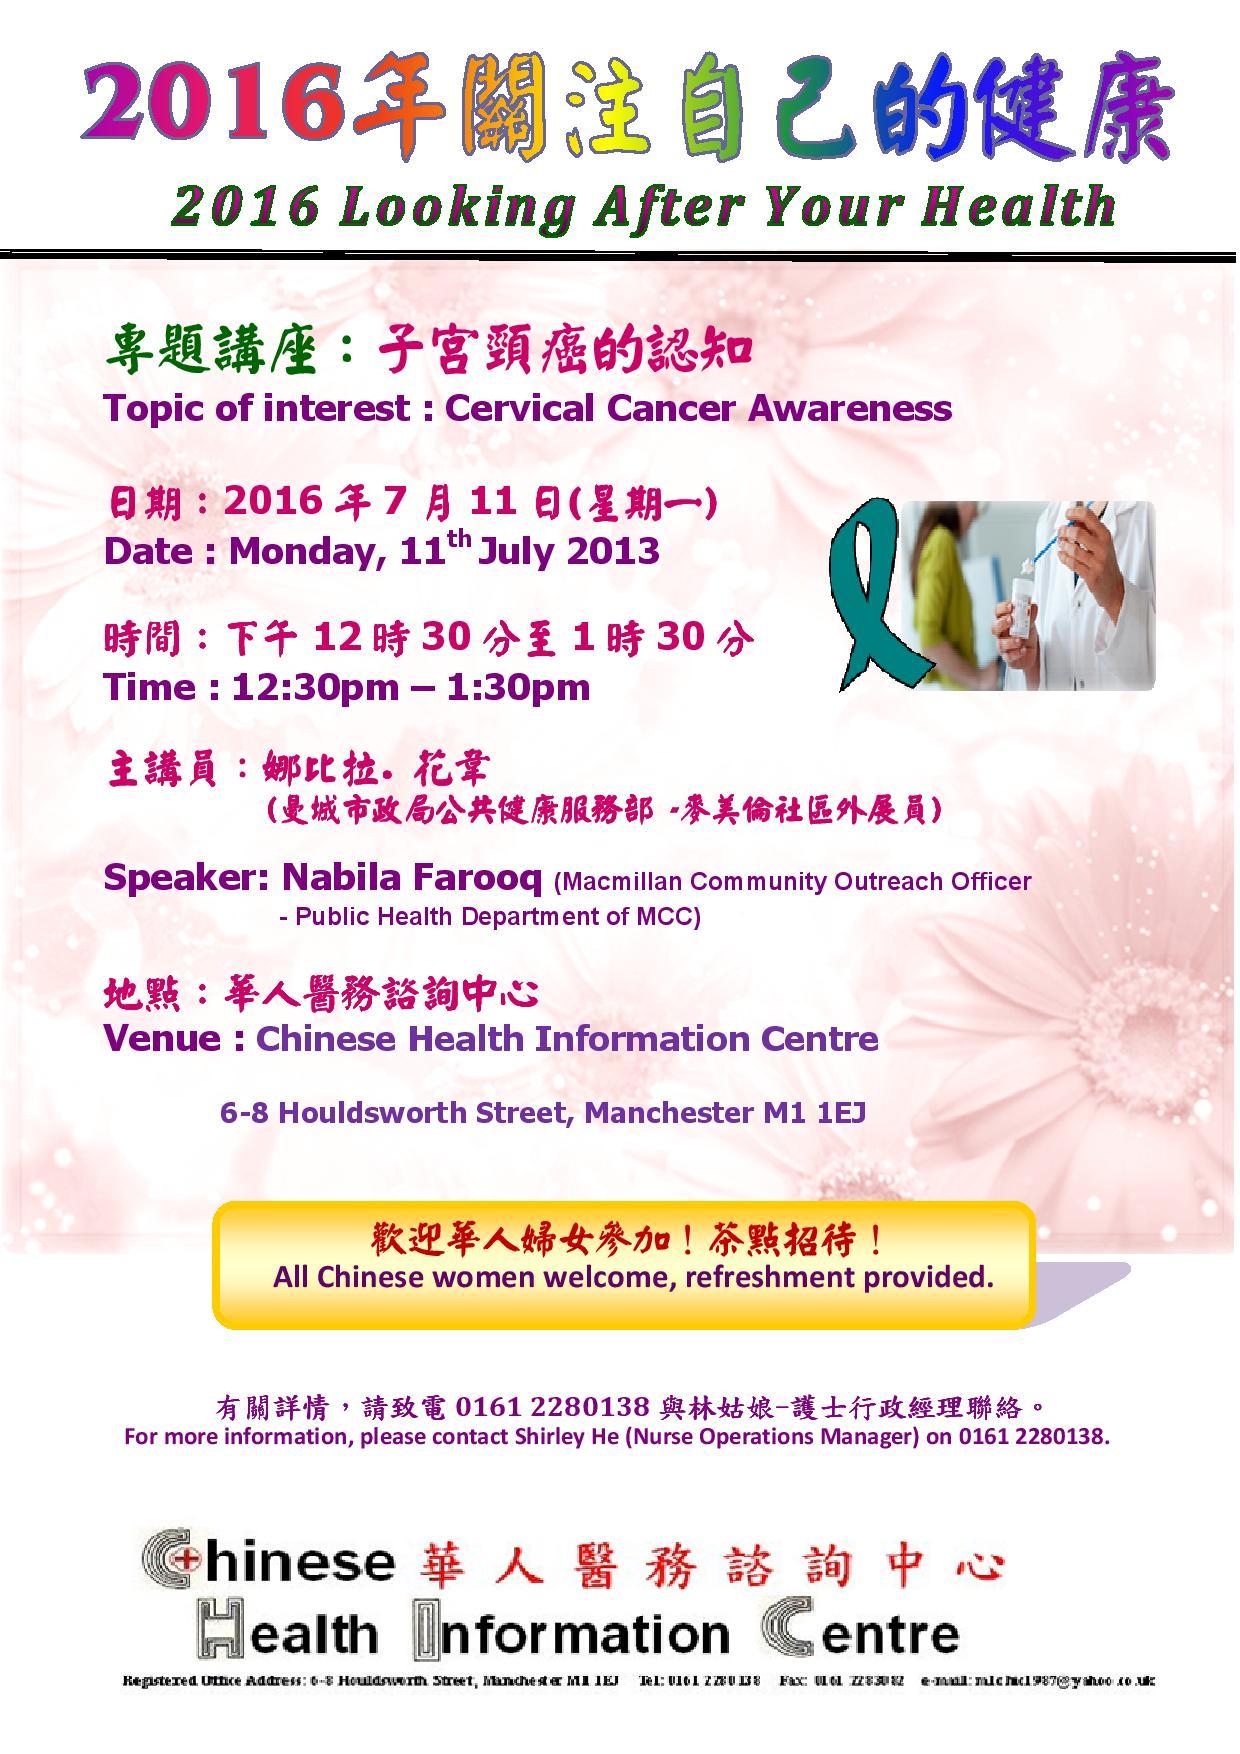 Cervical Cancer Awareness